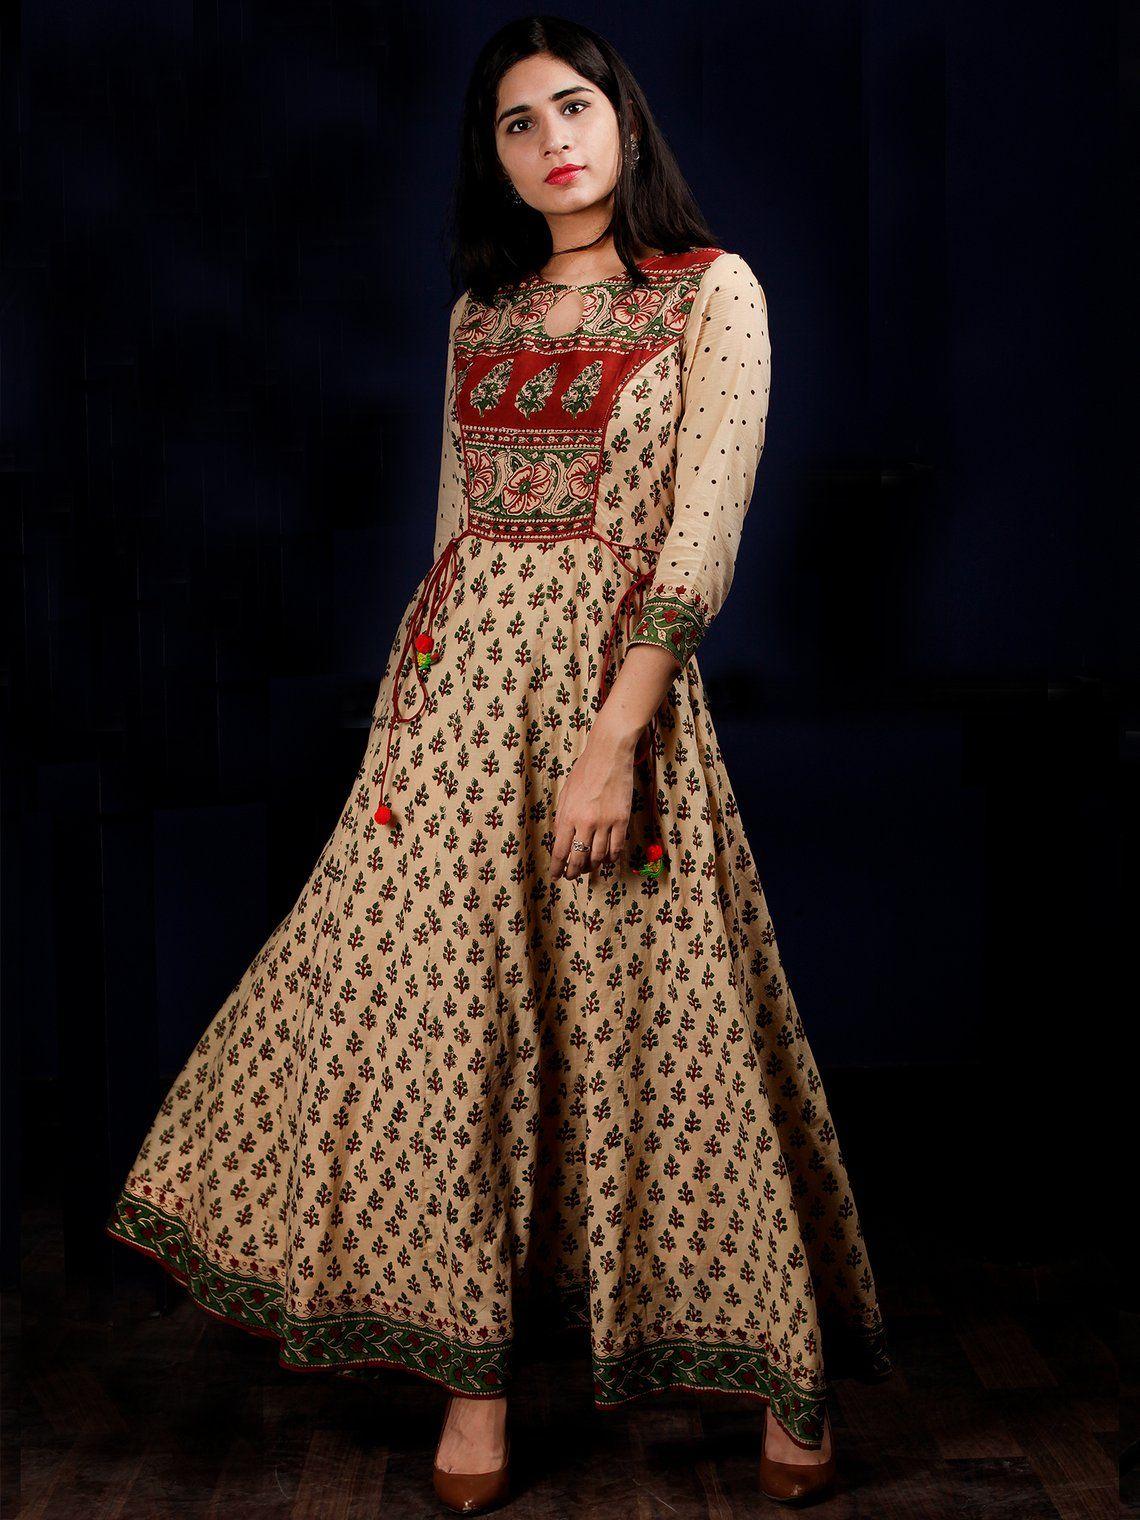 22b3a4aeb05168 Beige Rust Green Black Hand Block Printed Long Cotton Kali Dress With  Tassels - DS58F001